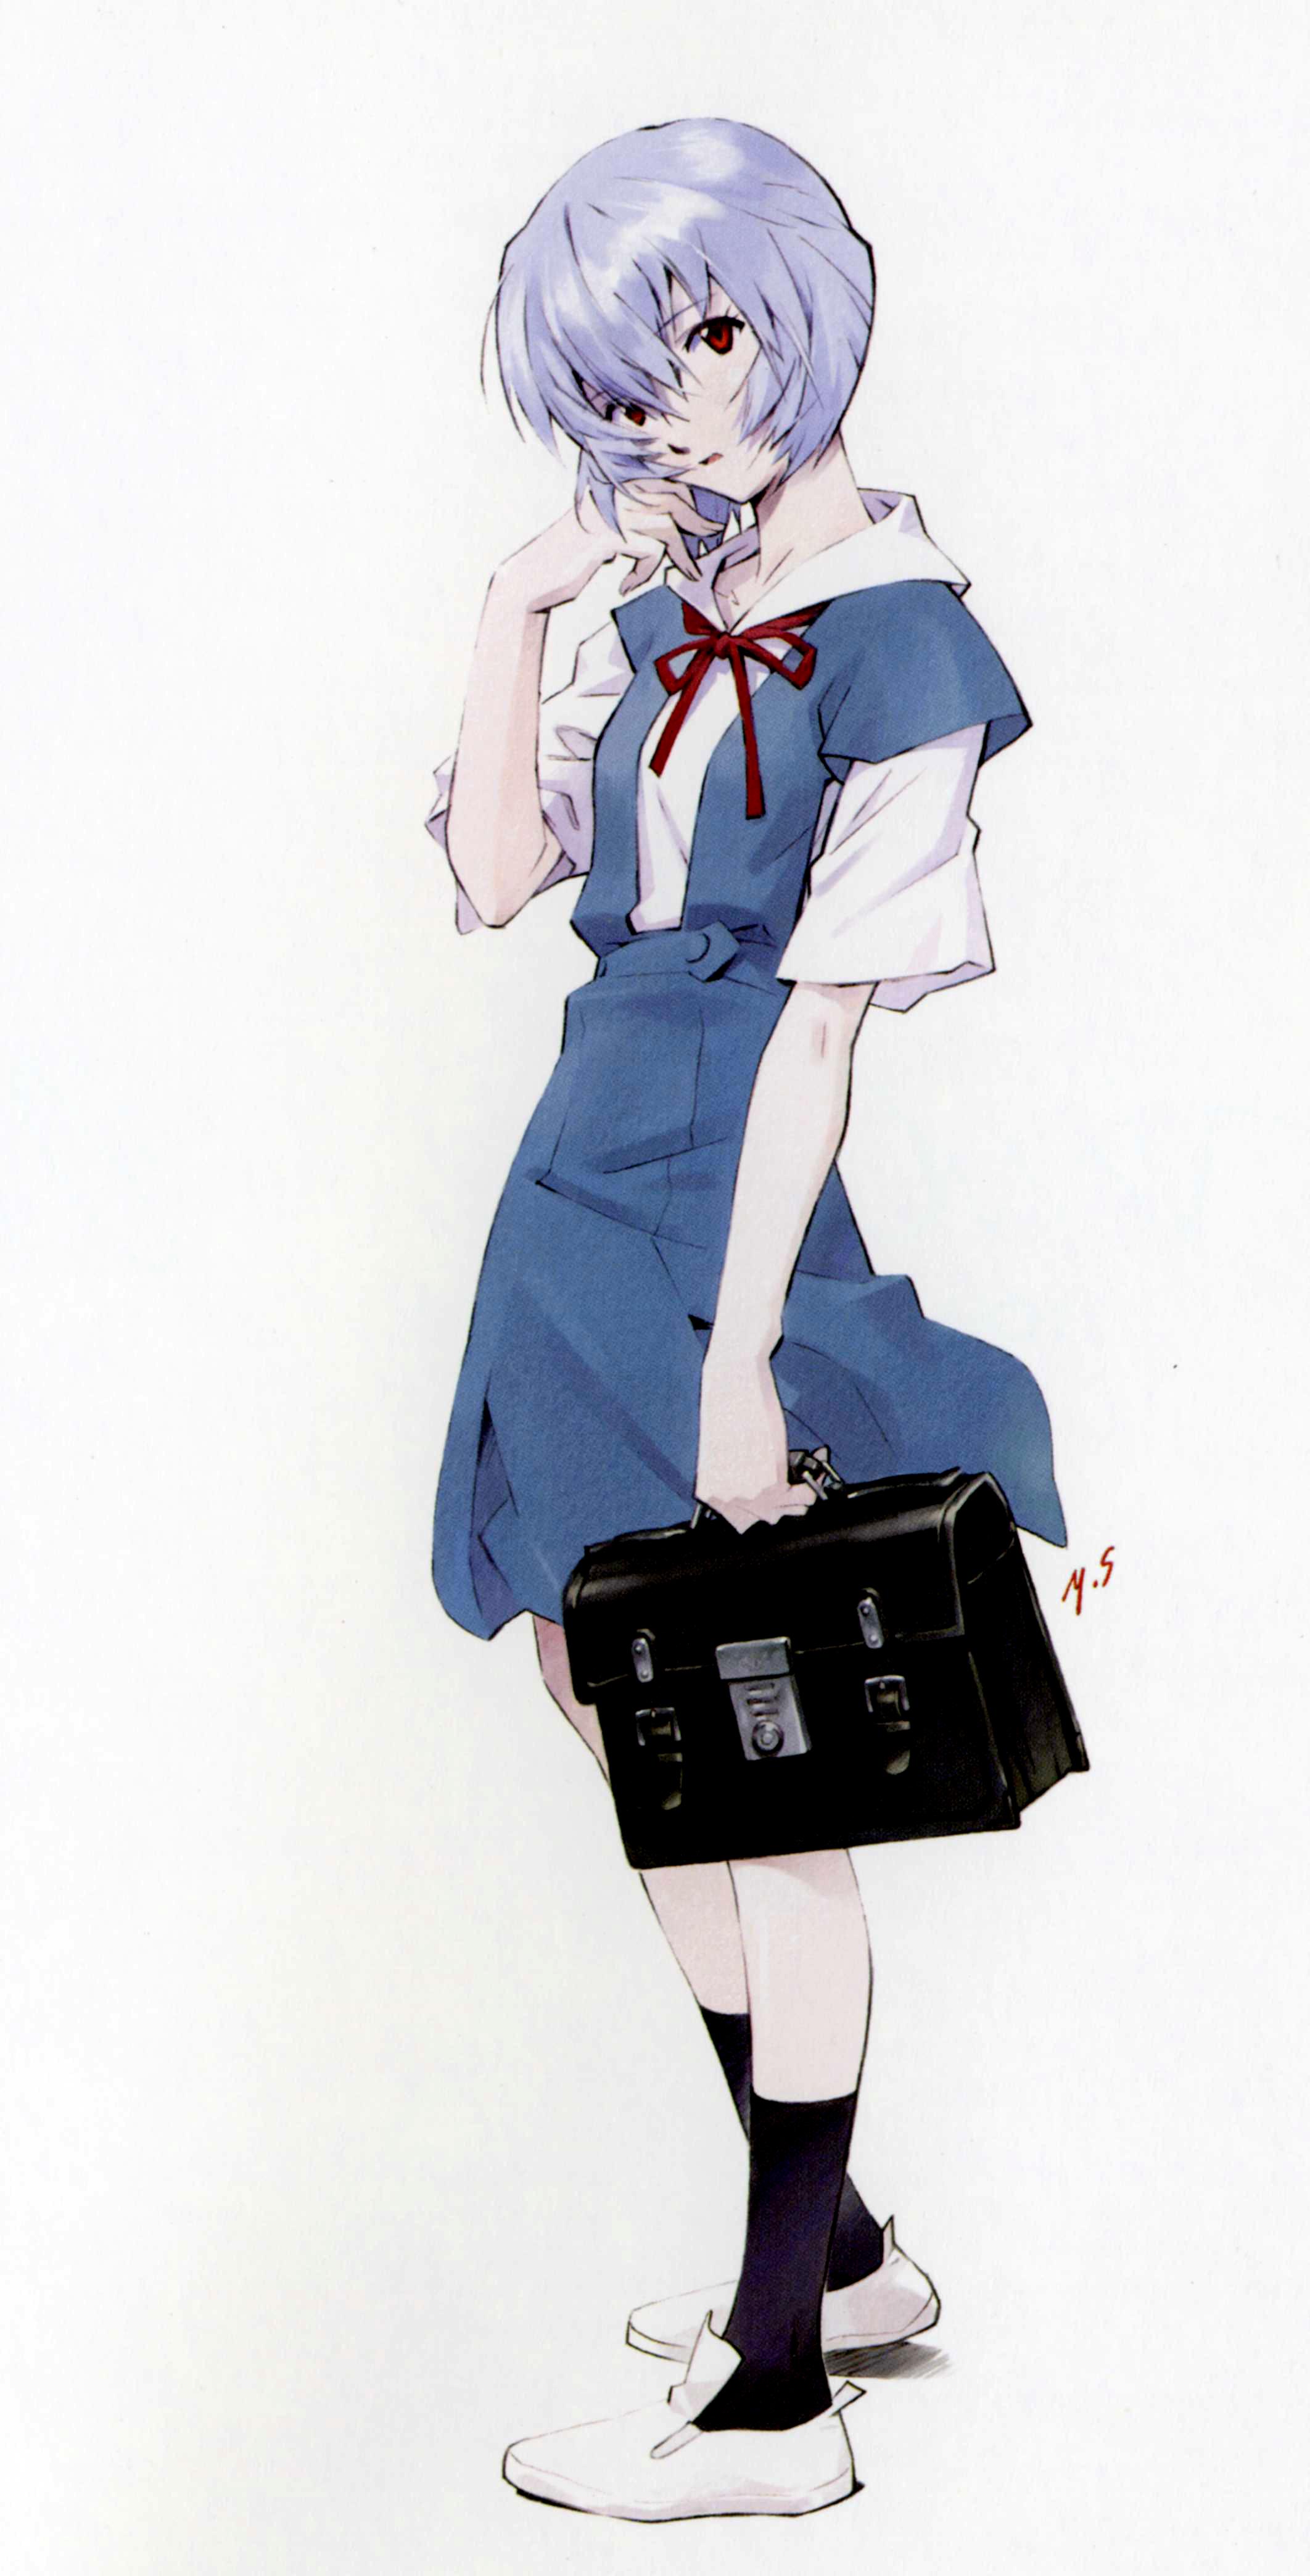 ... , Neon Genesis Evangelion, Carmine (Artbook), Ayanami Rei, School Bag